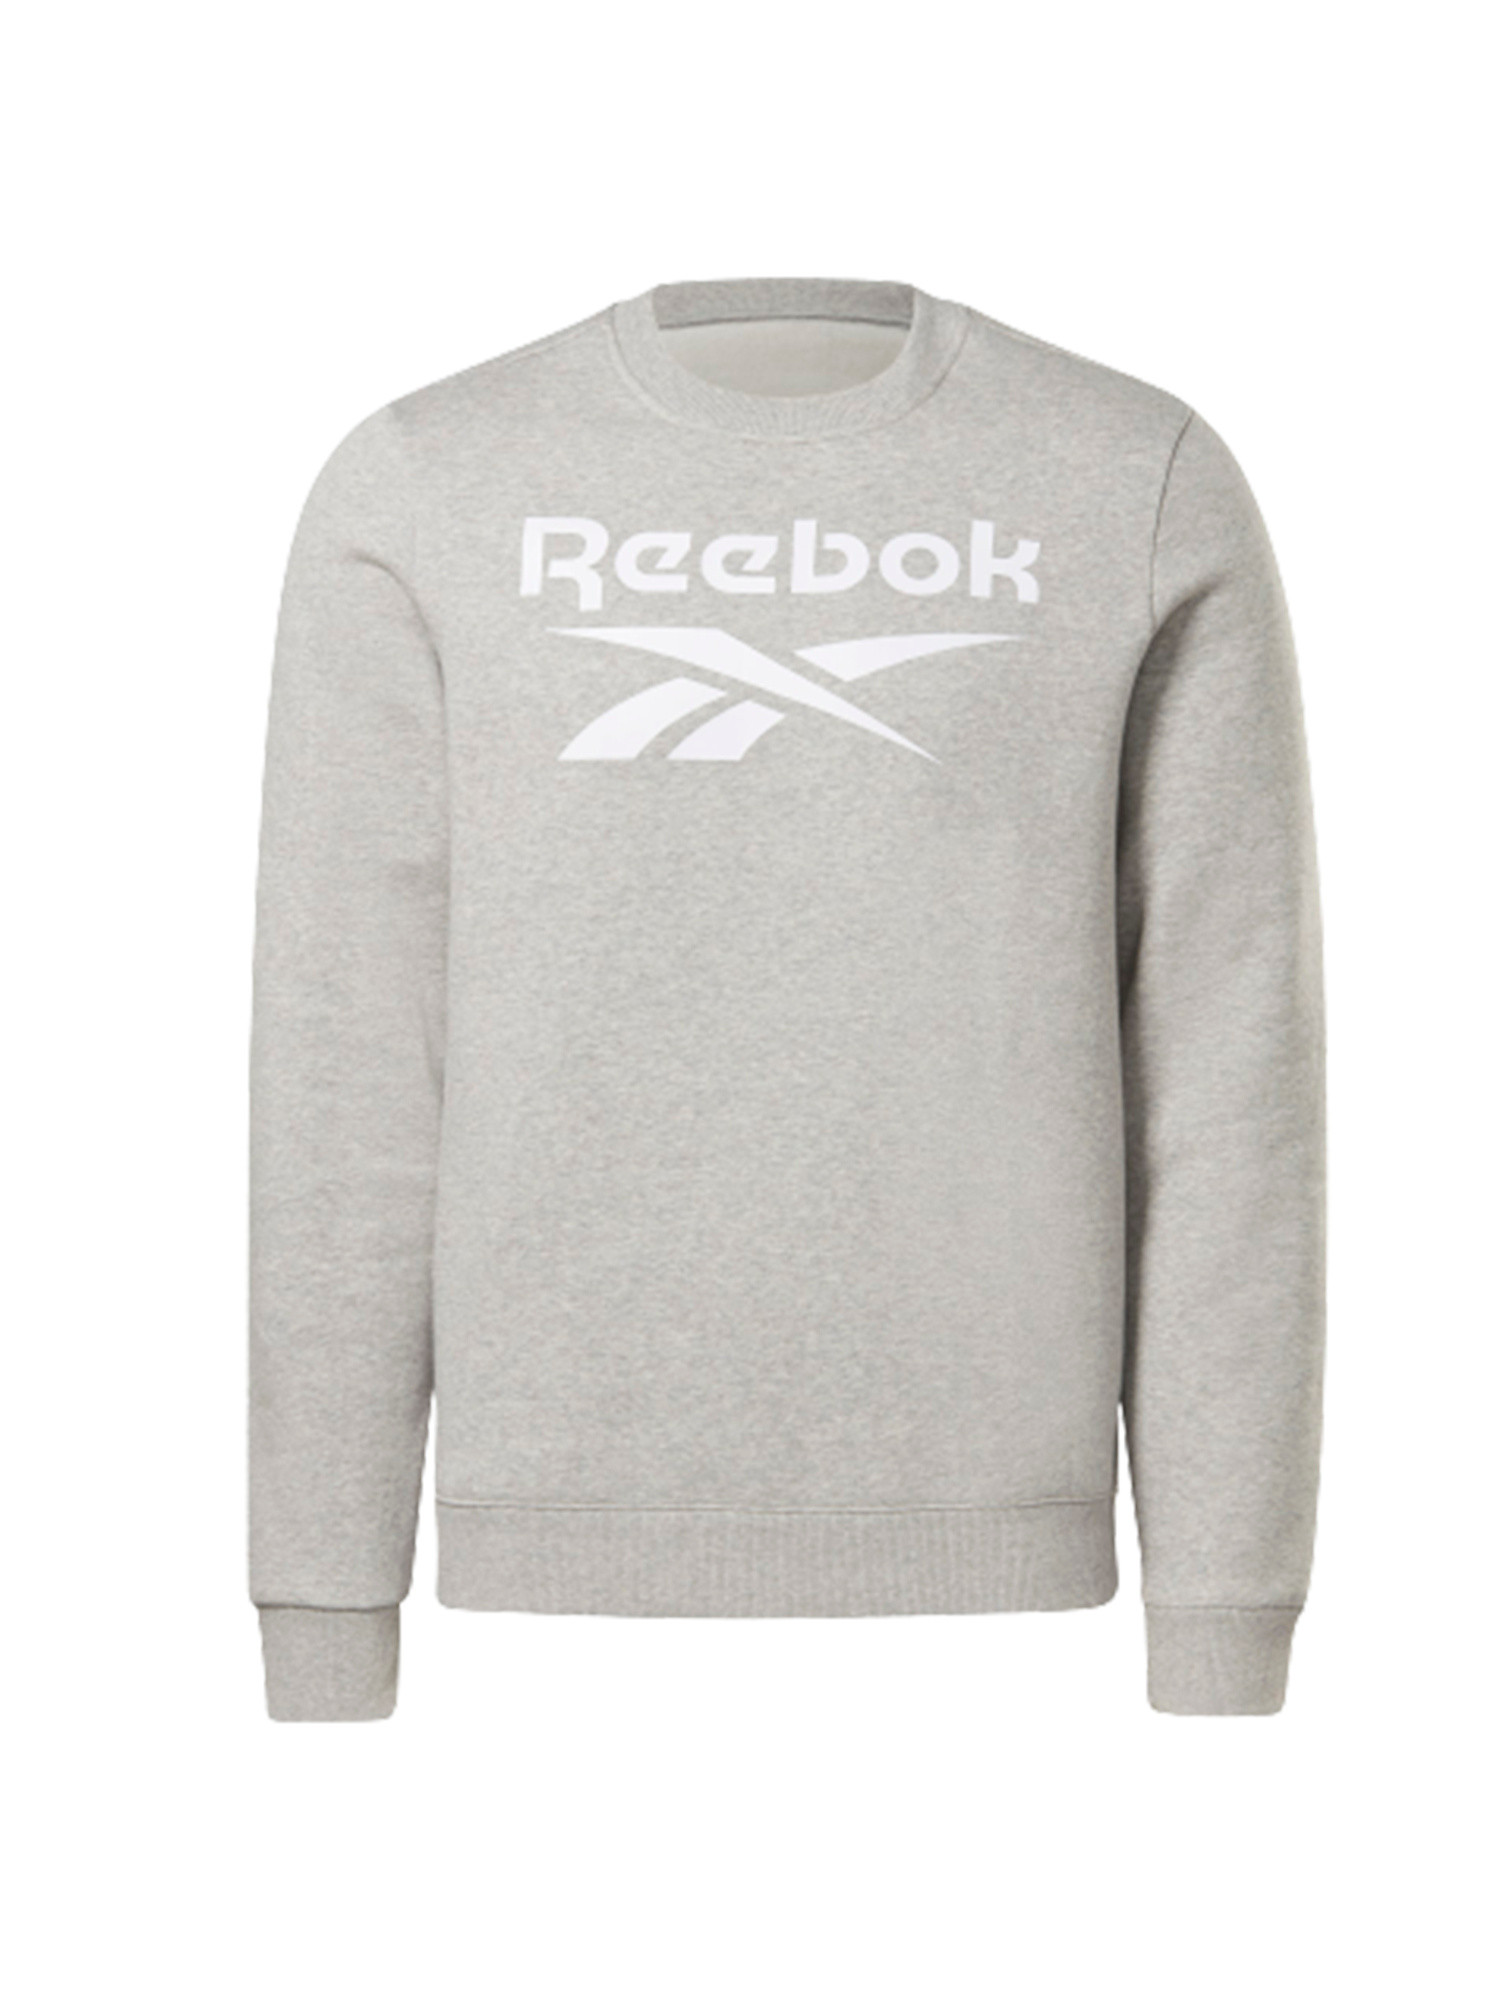 Felpa girocollo Reebok identity fleece, Grigio, large image number 0